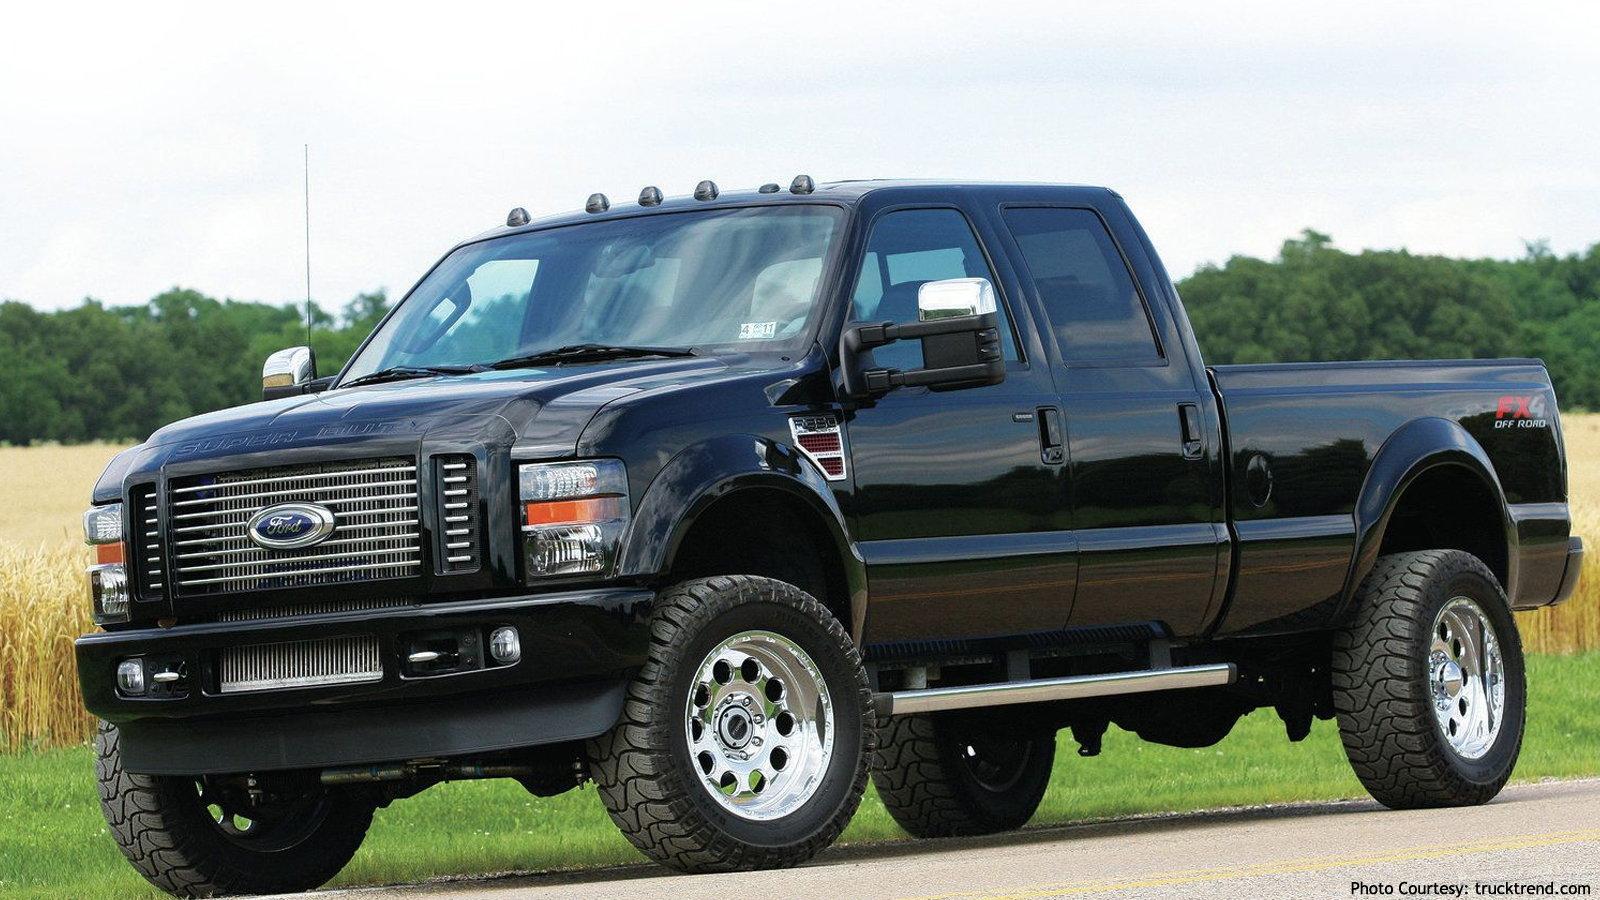 Ford F-350 PowerStroke Diesel